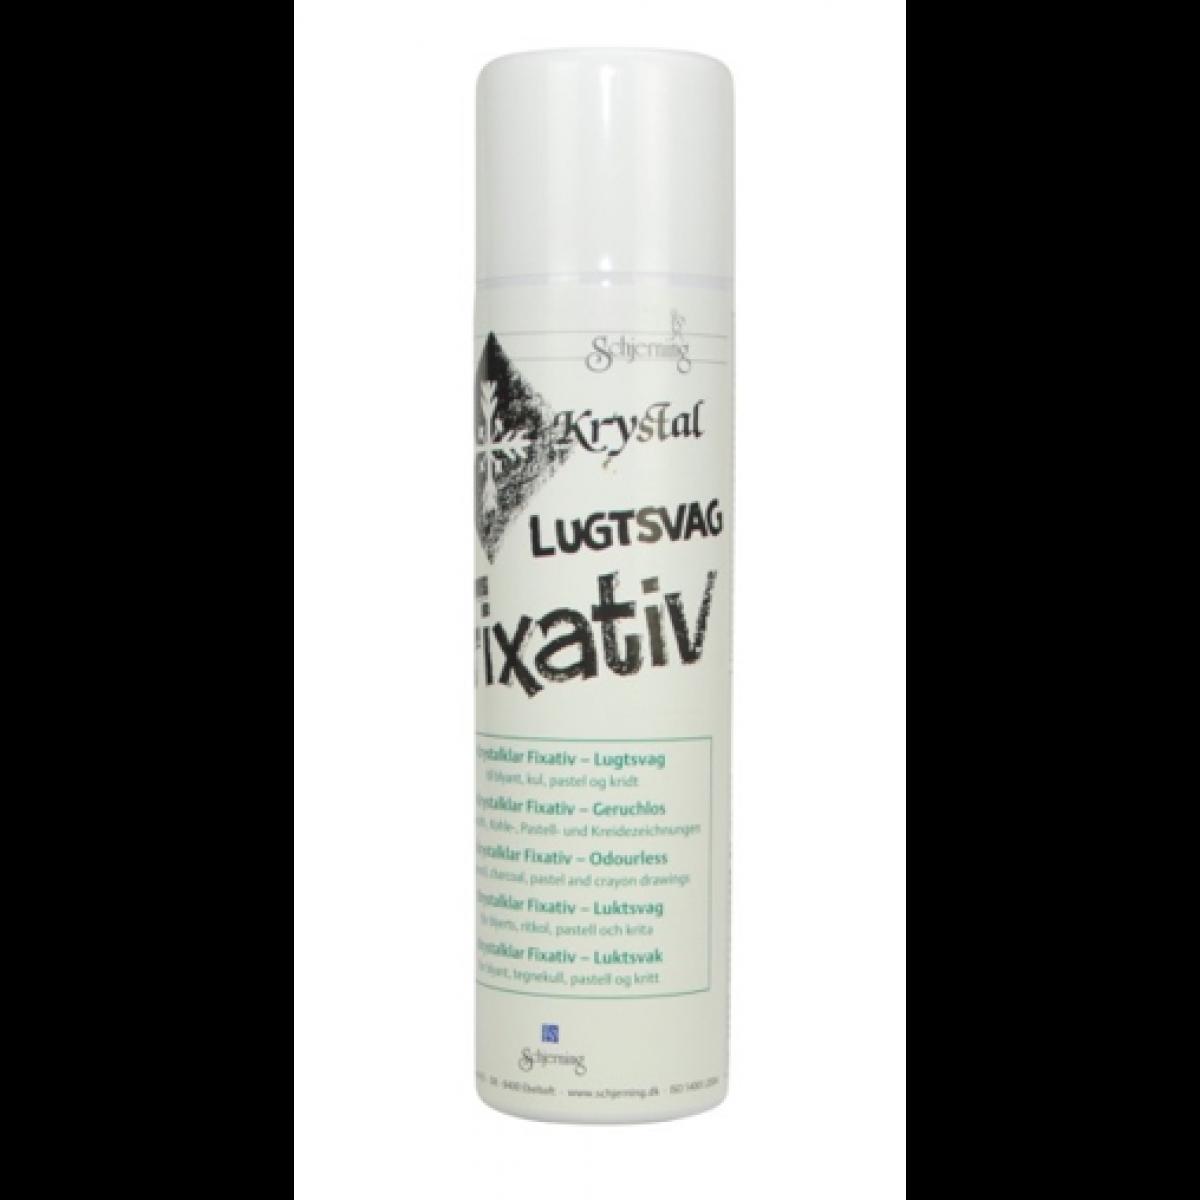 Fixativ spray, Schjerning, lugtsvag, 400ml